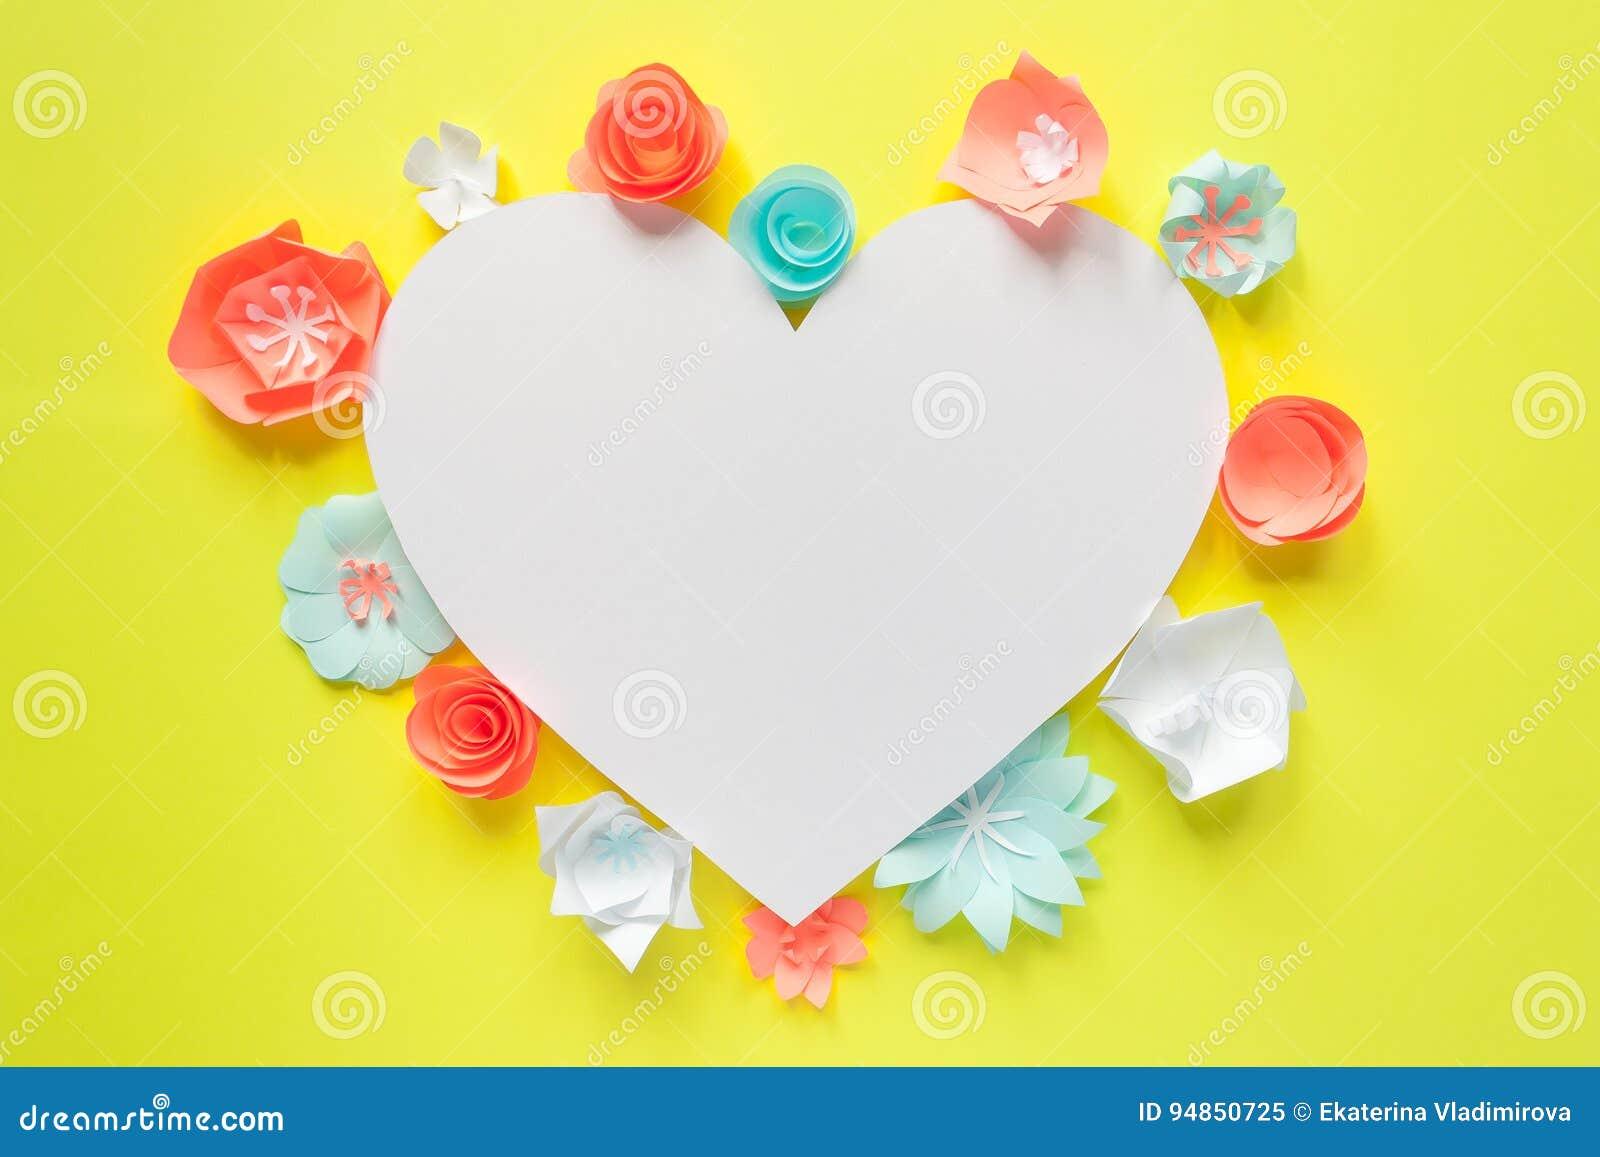 Heart Frame With Color Paper Flower Stock Illustration